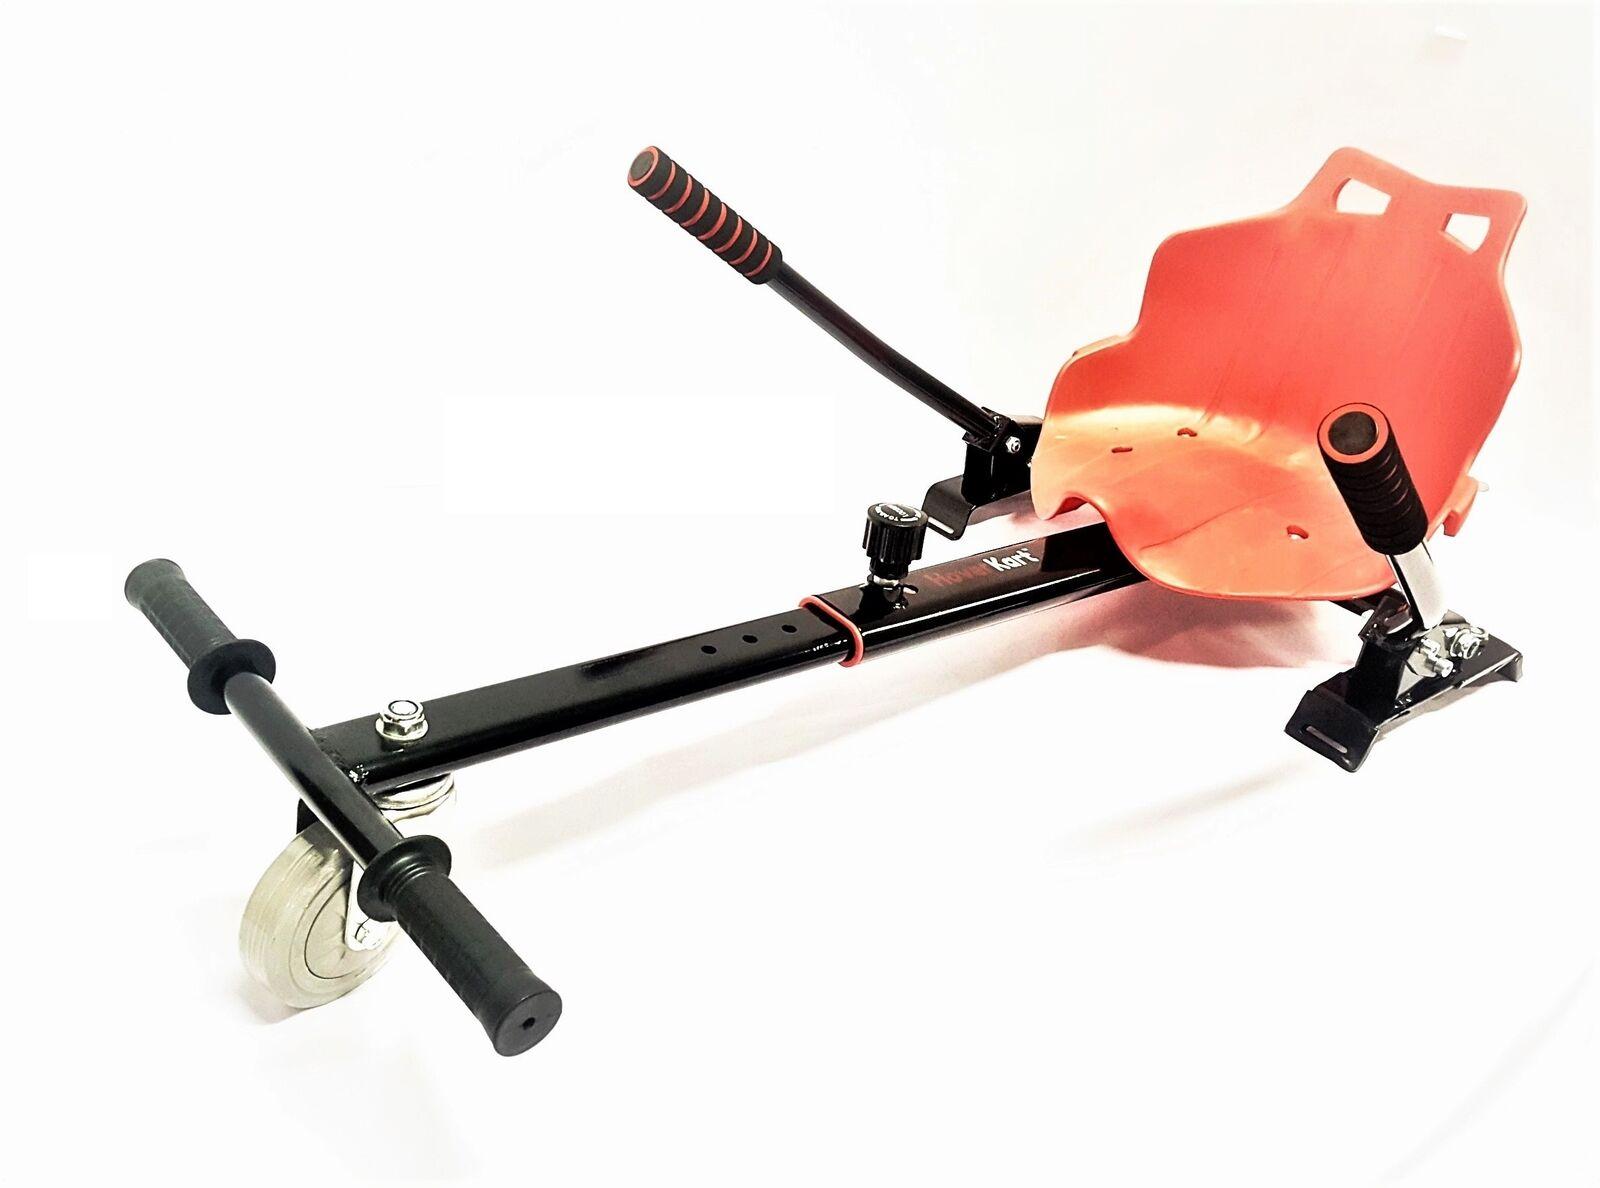 Roja Asiento  Original hoverkart converdeir Aeropatines en A Go Kart Cochero HK5S  hasta un 70% de descuento